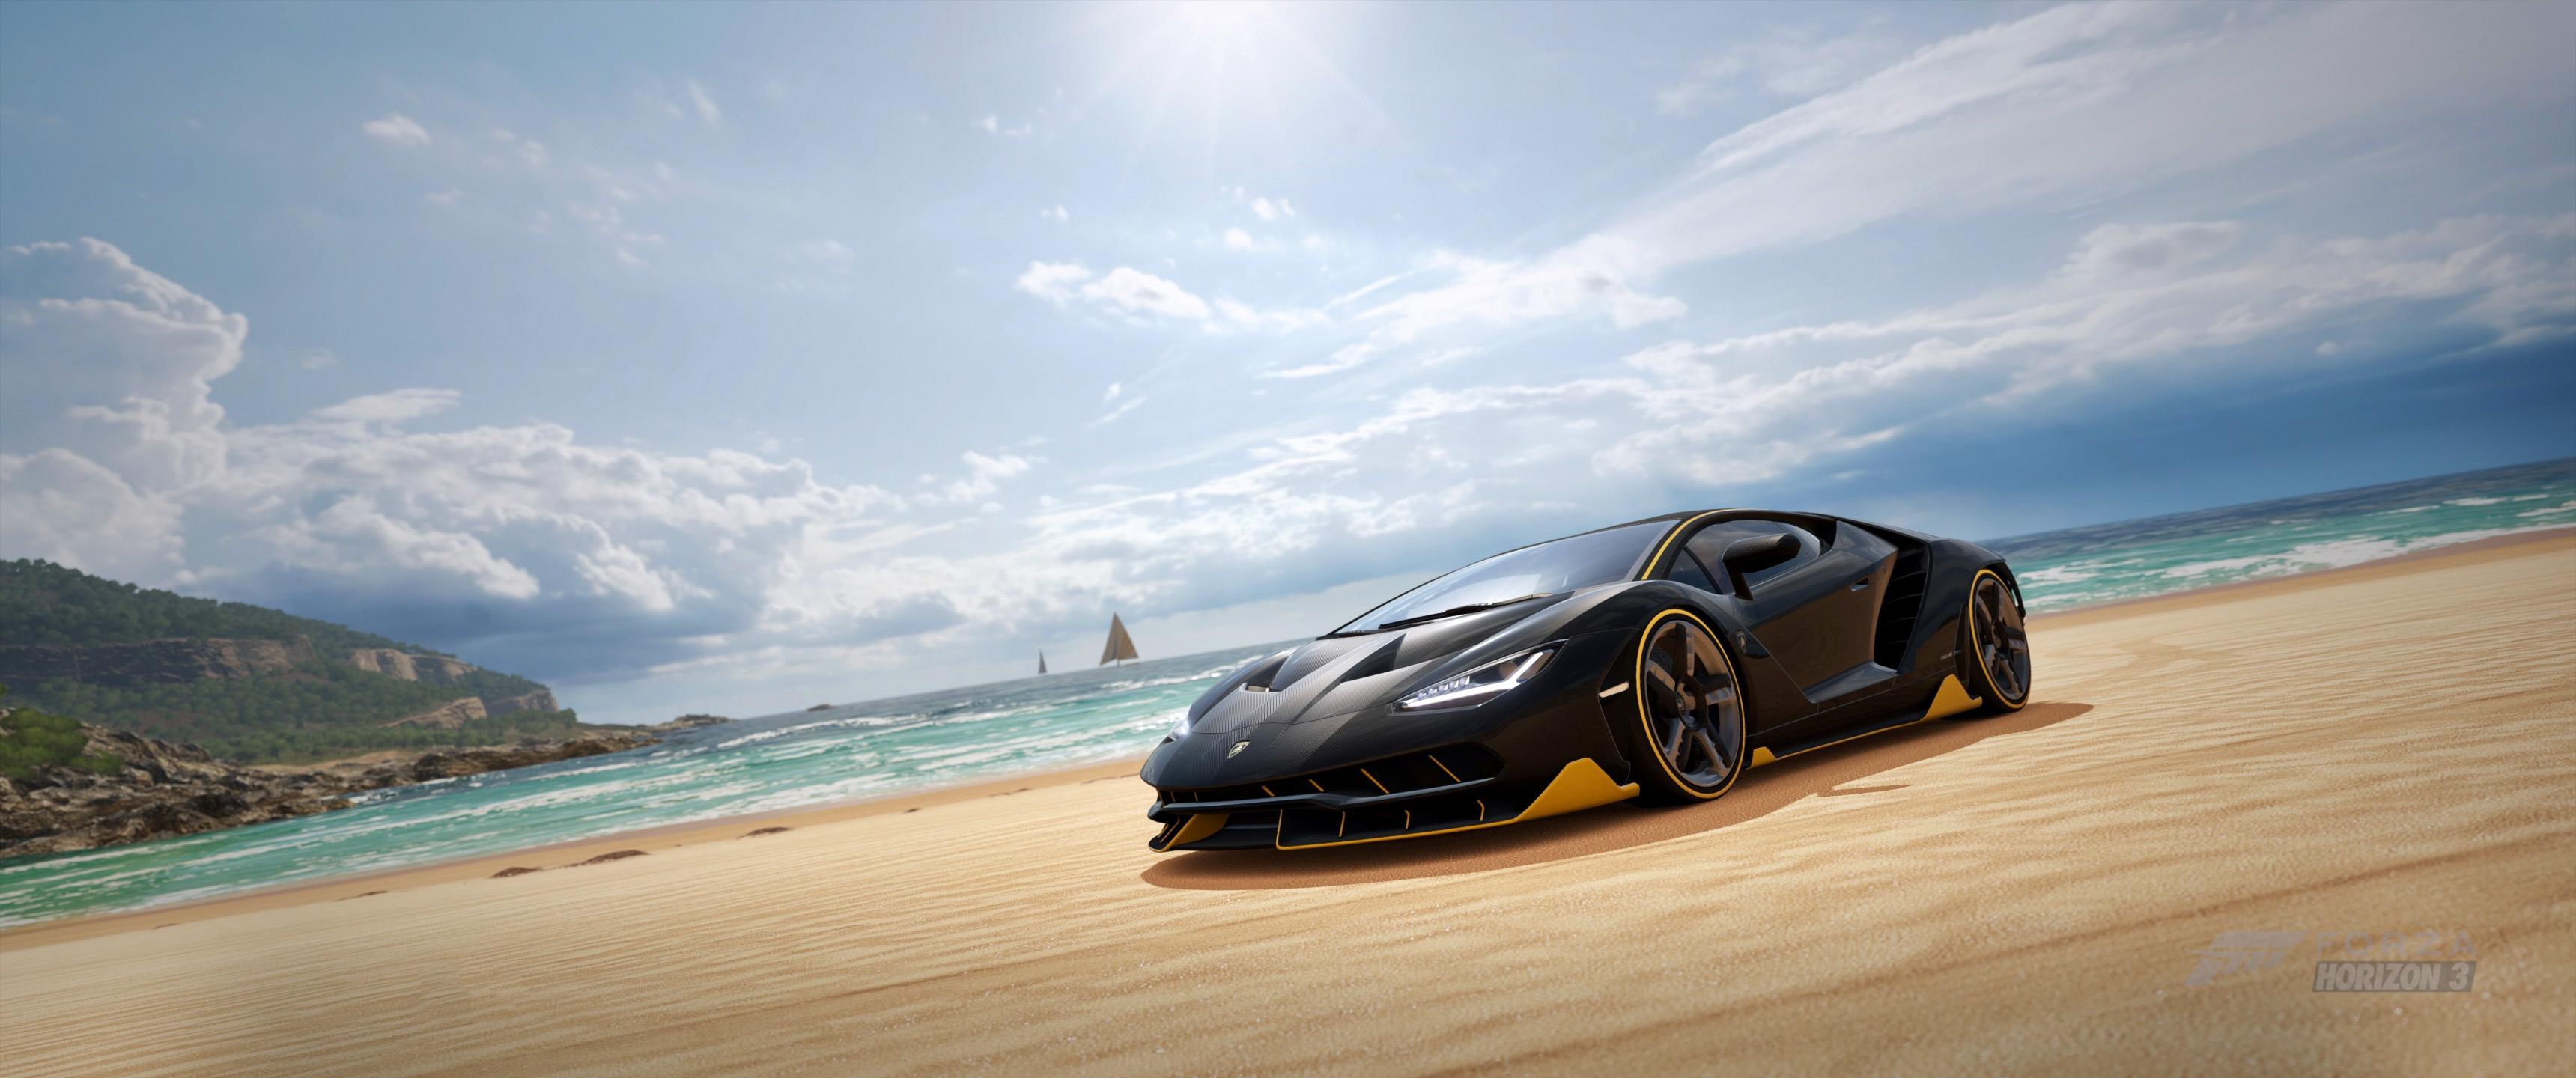 Forza Horizon 3 Lamborghini Centenario Supercar Wallpapers ID826246